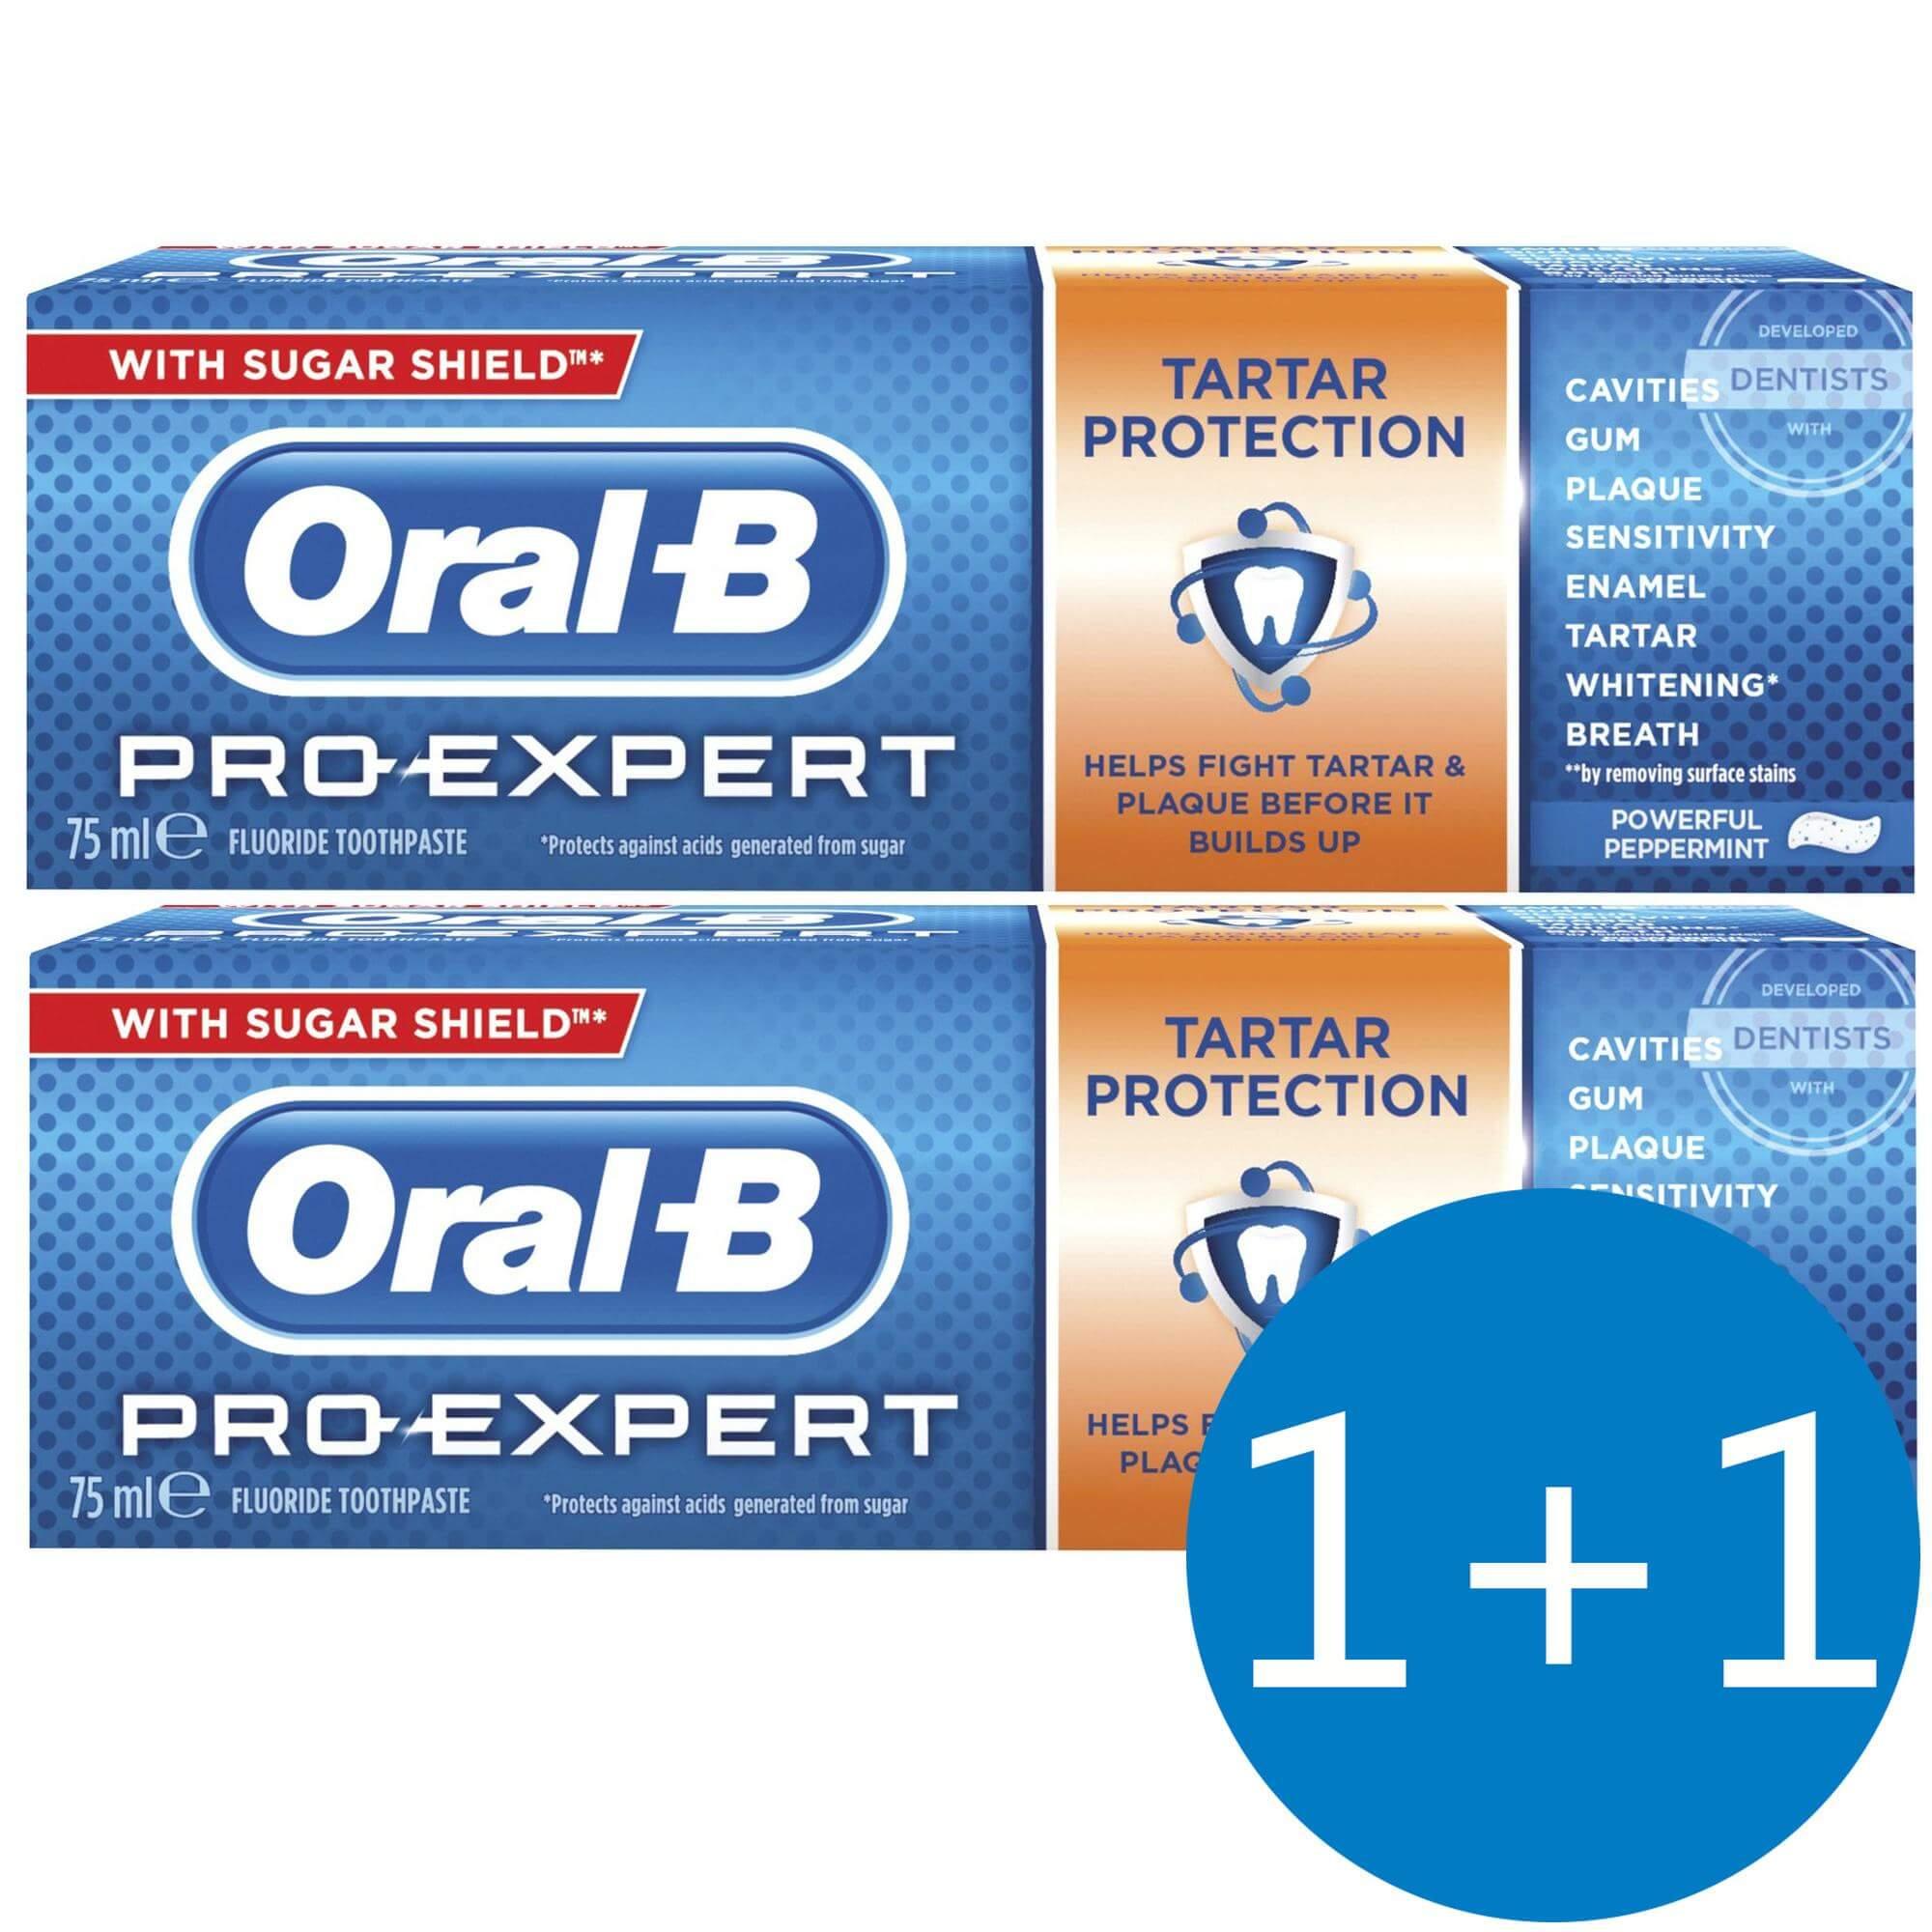 Oral-B Πακέτο Προσφοράς Pro-Expert Οδοντόκρεμα Κατά Tης Πέτρας 75ml Προσφορά 1+1 Δώρο